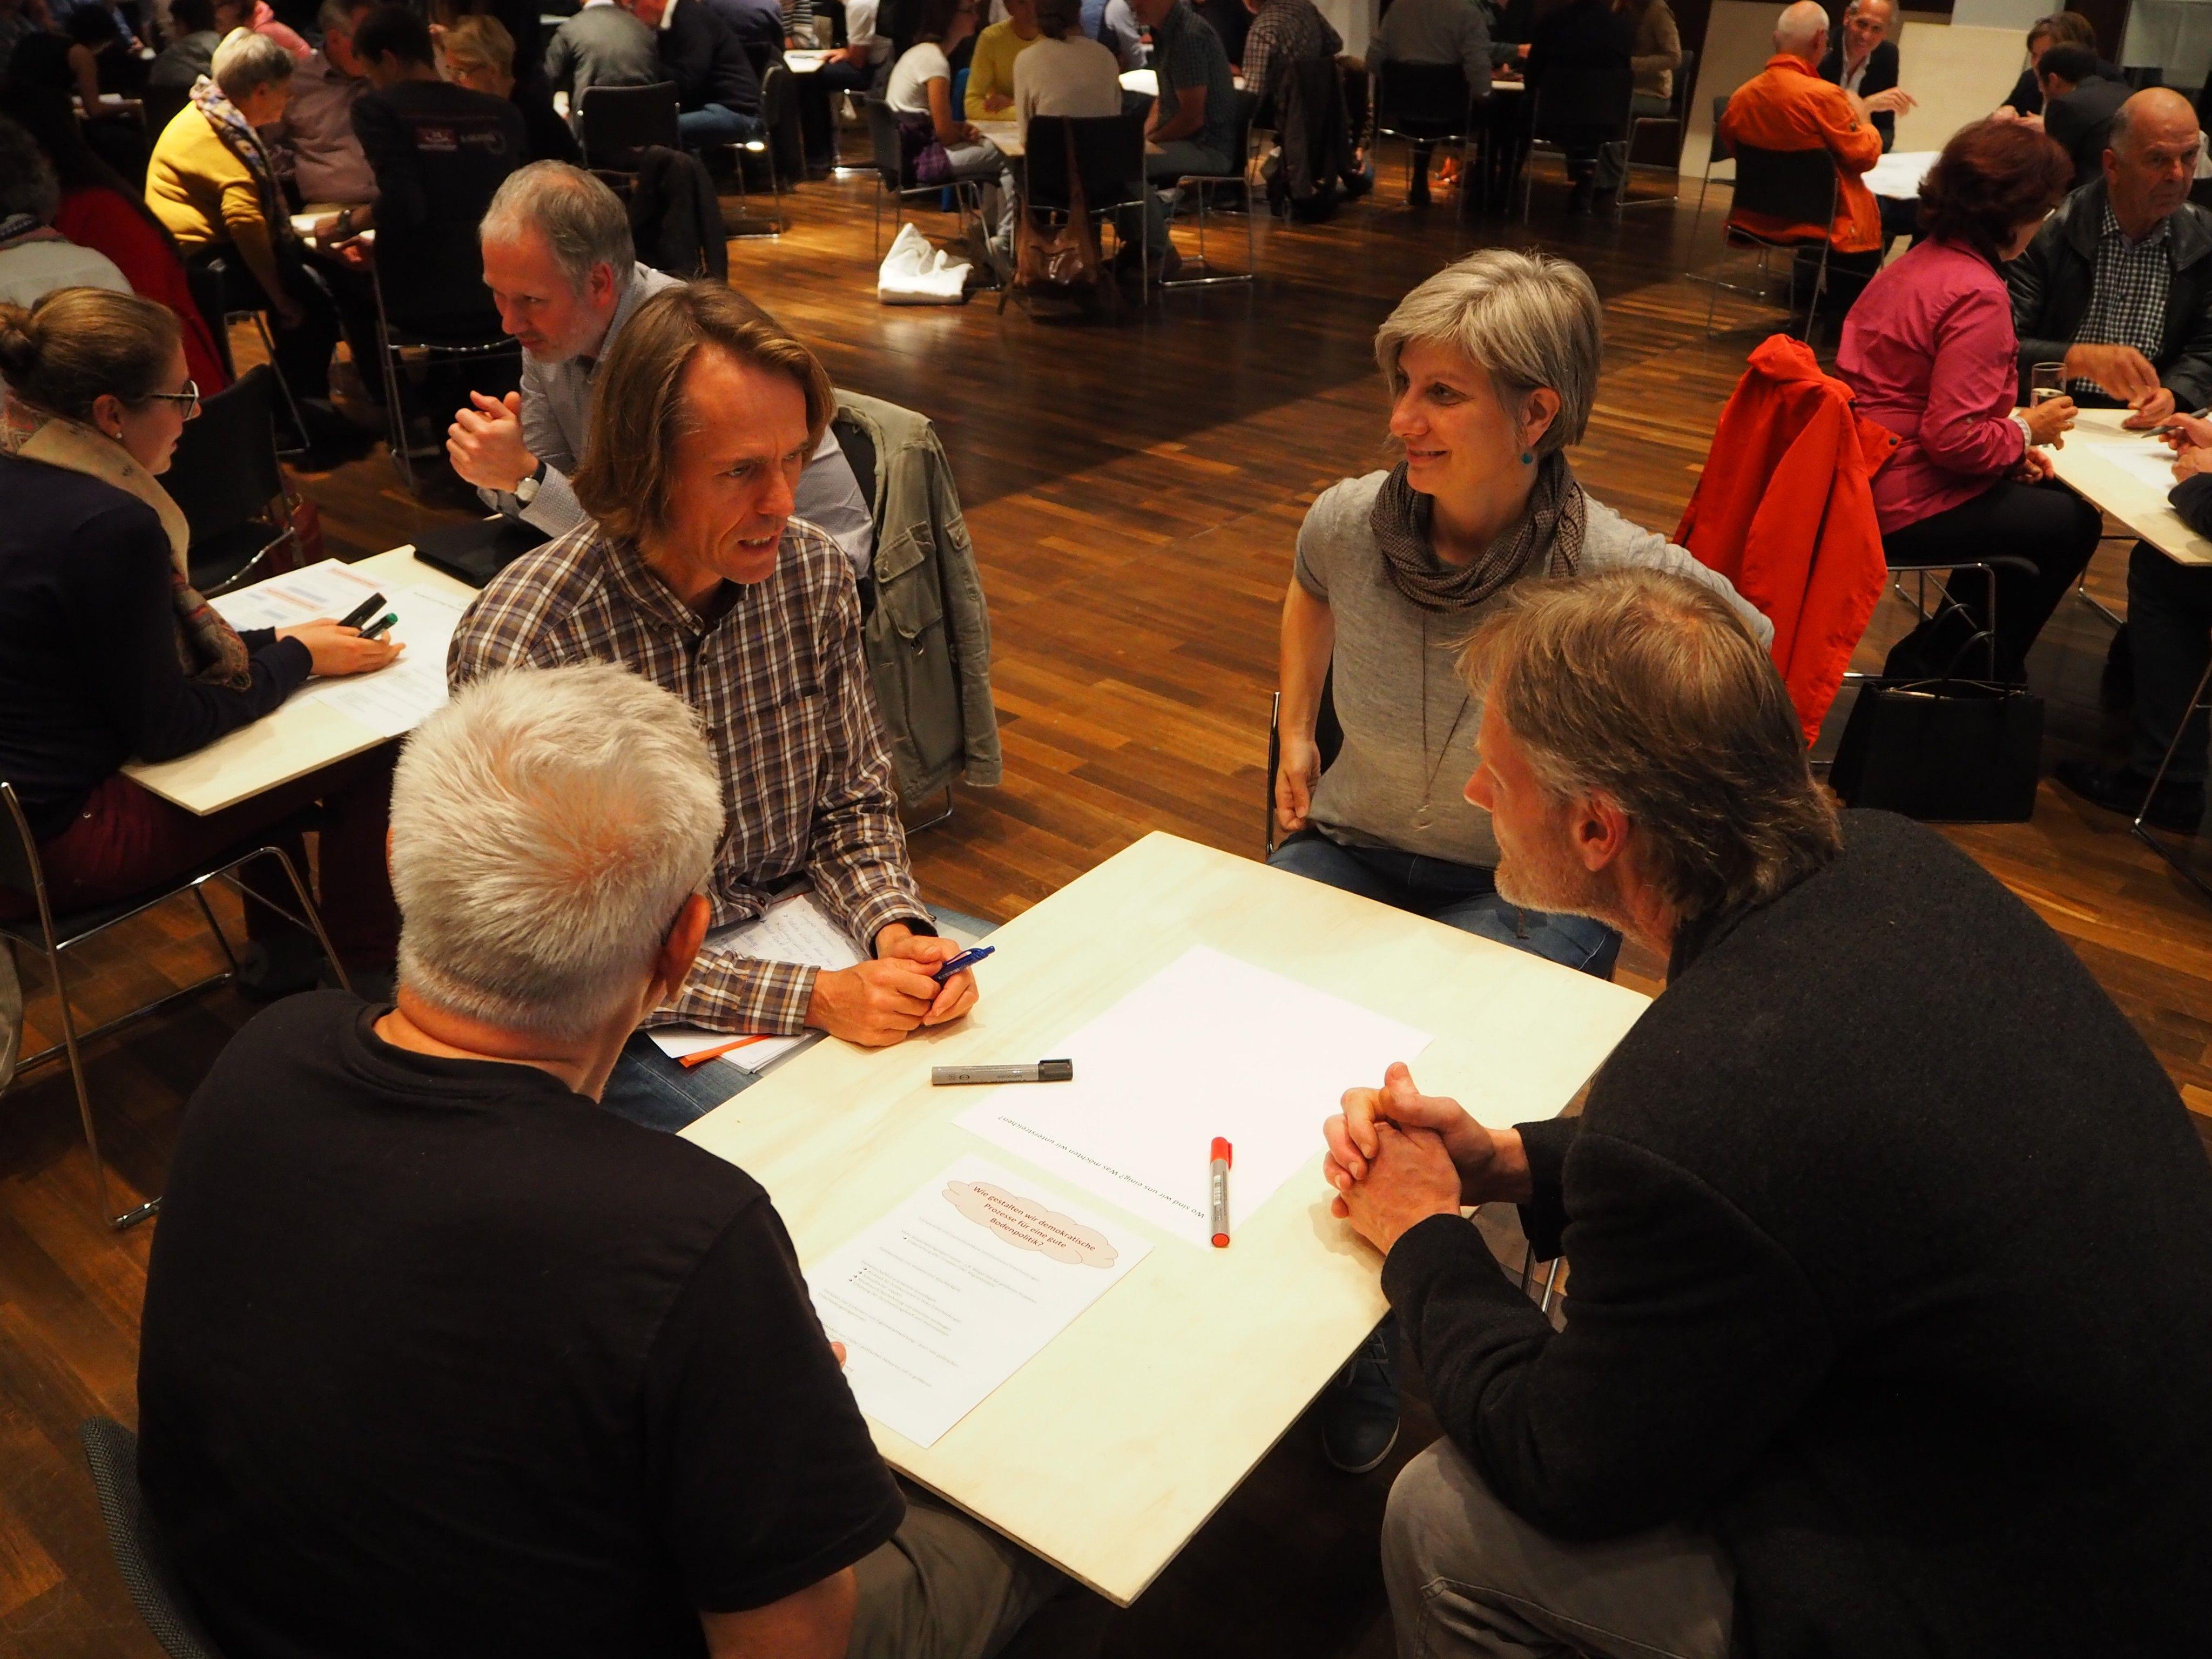 Diskussion im Rahmen des Bürgercafes in Rankweil